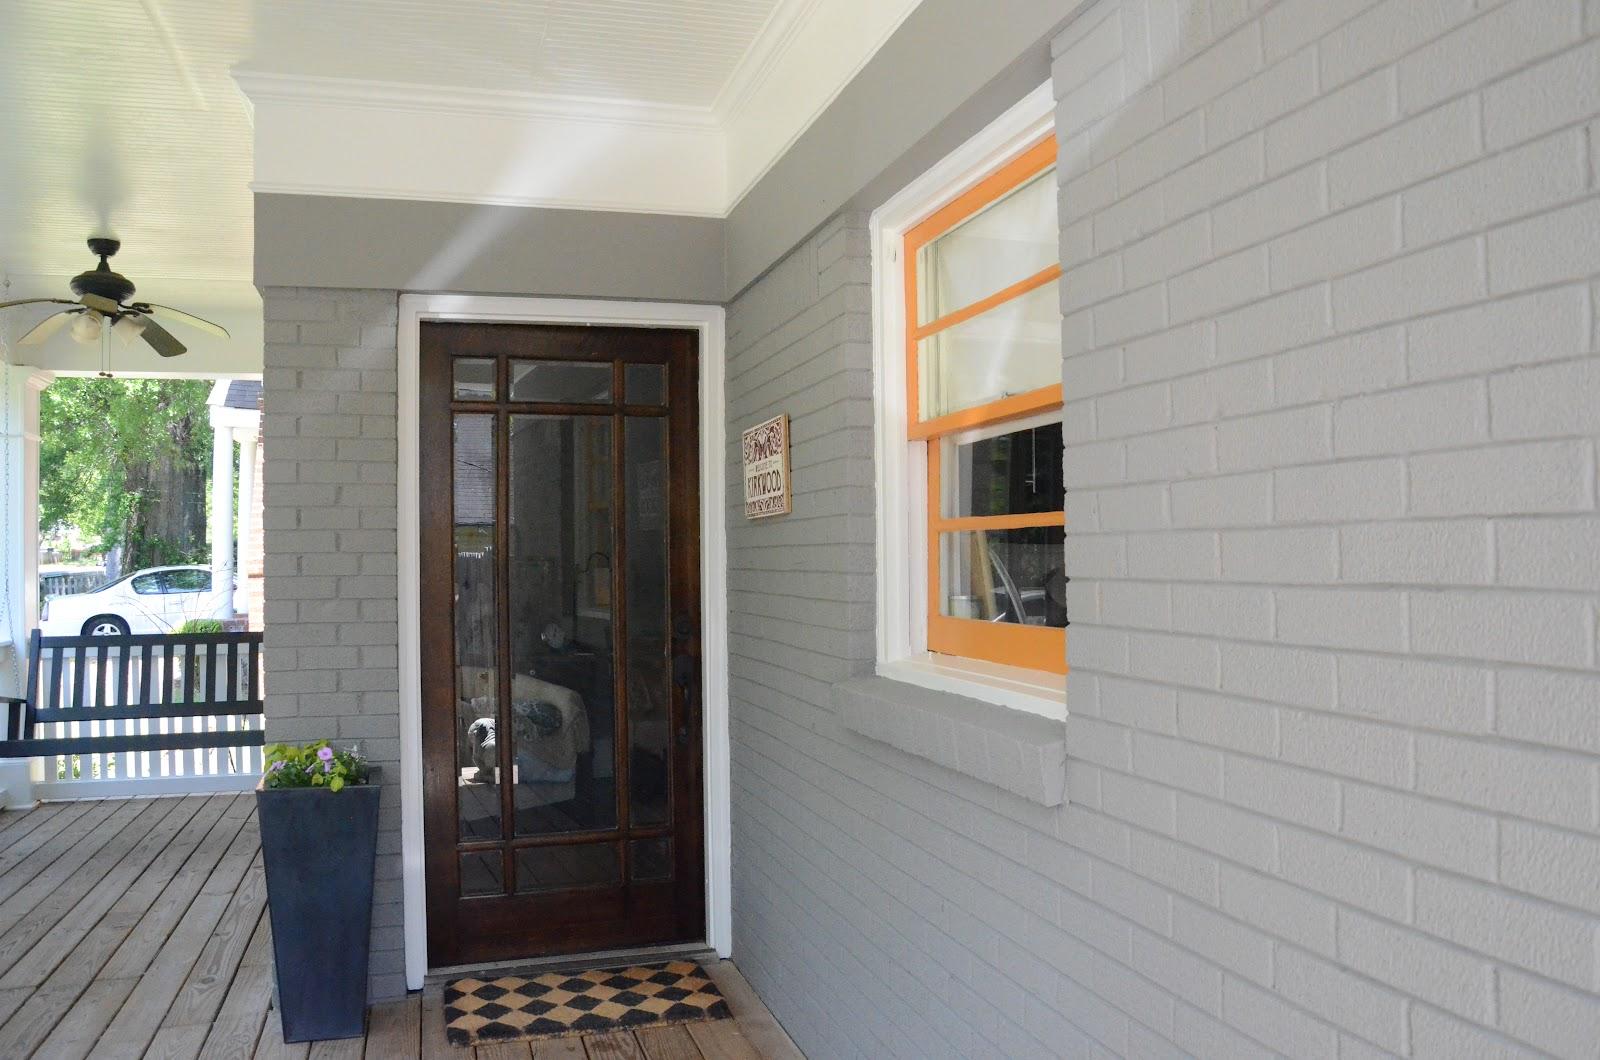 Exterior House Colors: Mason Jar Champagne: House Paint Reveal